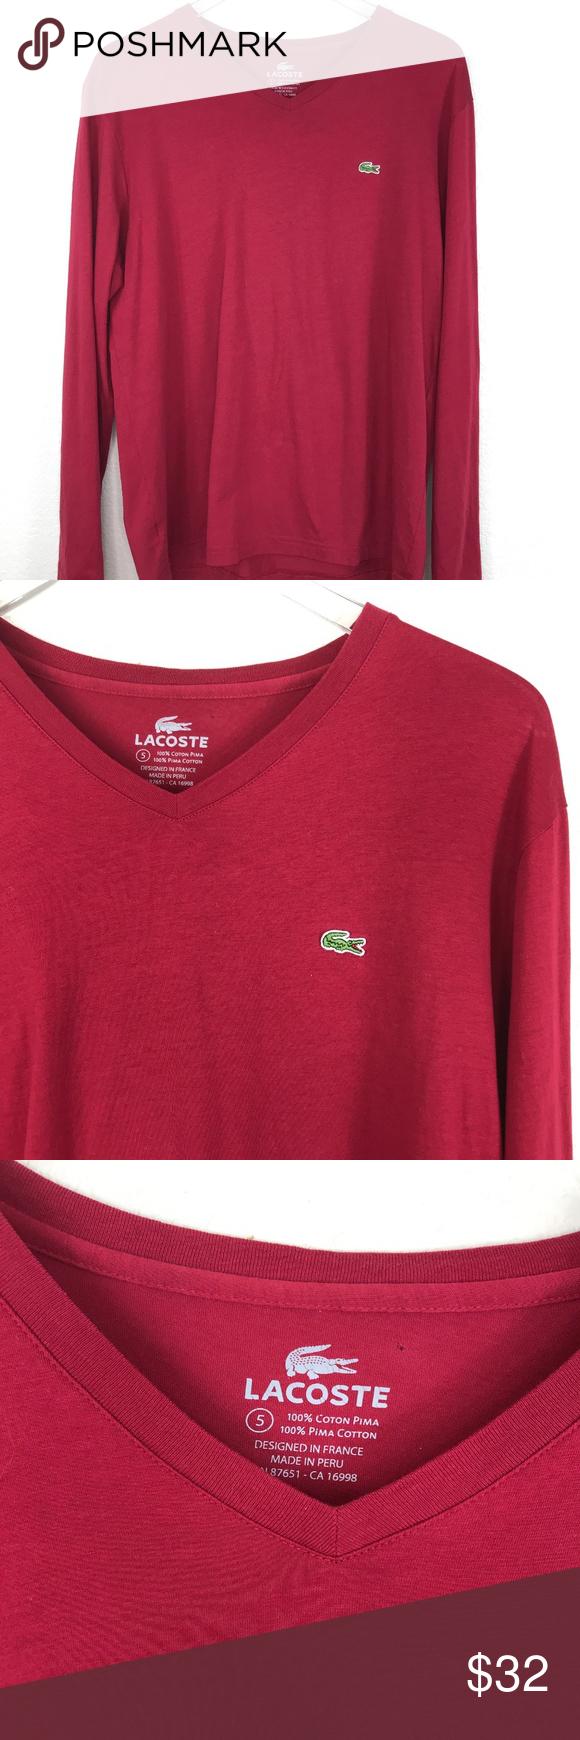 dd502f54 Lacoste Long Sleeve V-neck Cotton Jersey T-shirt L Lacoste Mens ...